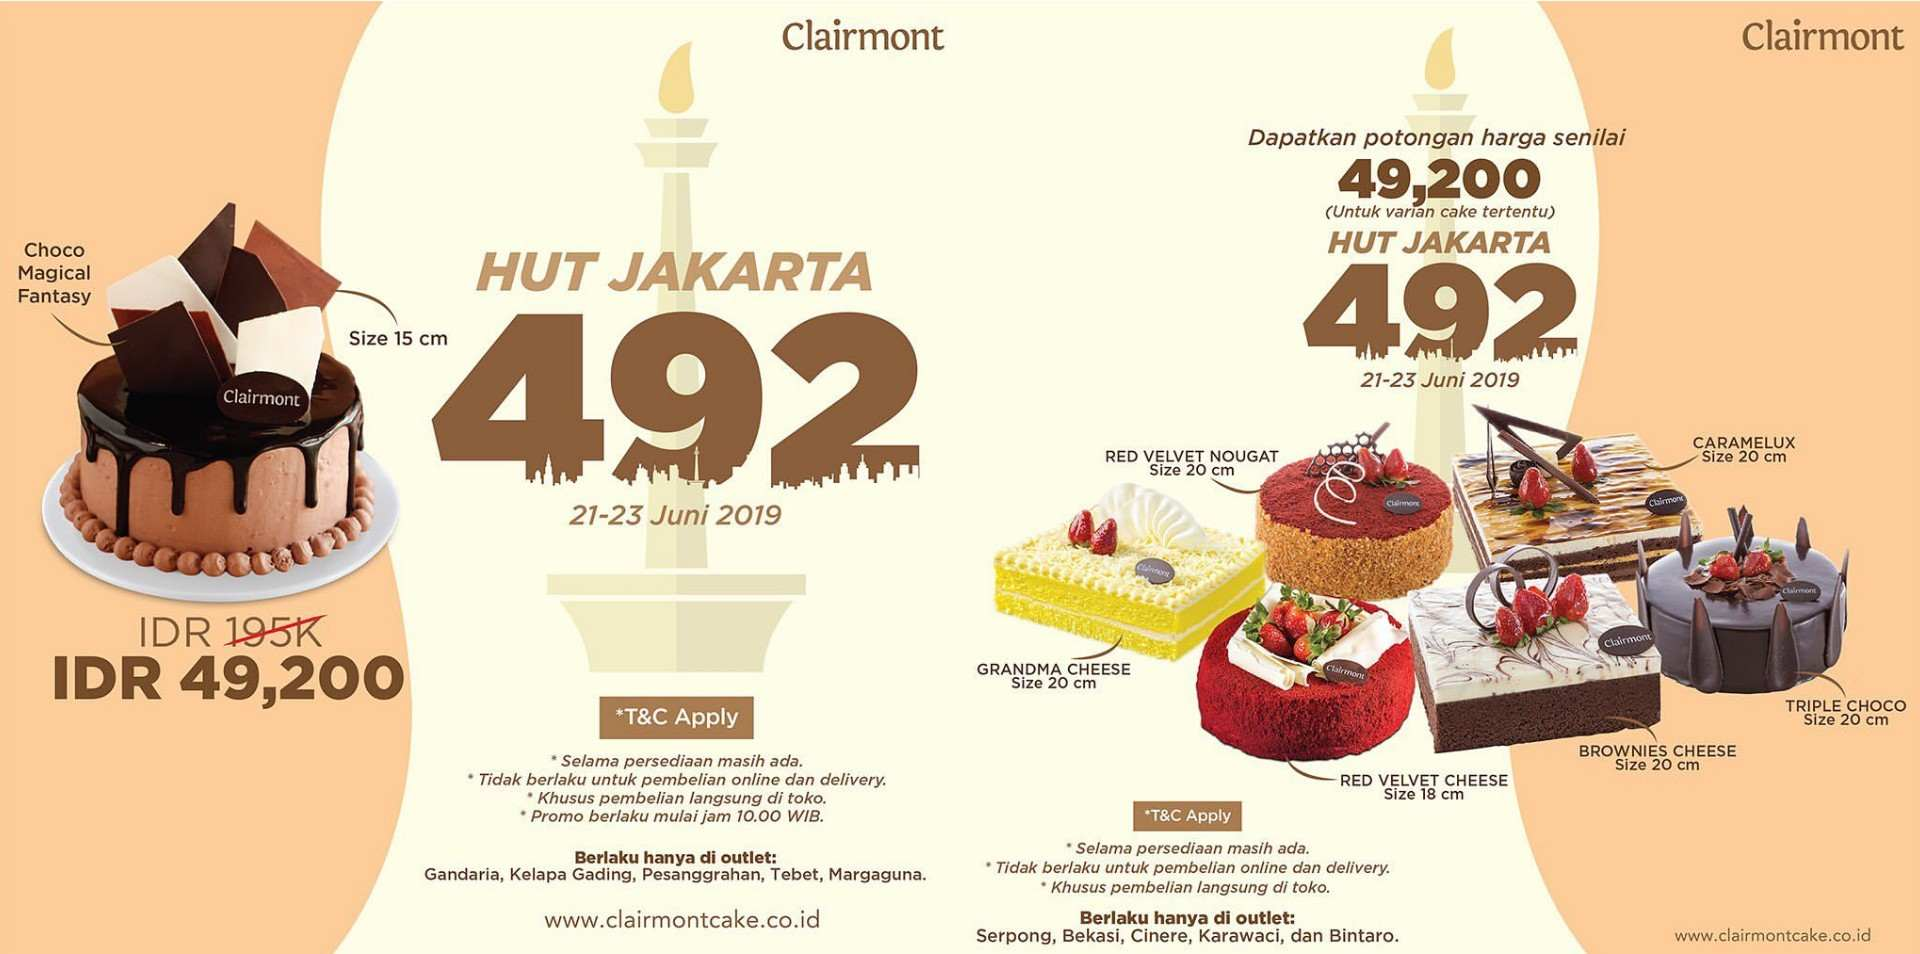 Diskon CLAIRMONT Promo SPESIAL HUT JAKARTA Ke-492